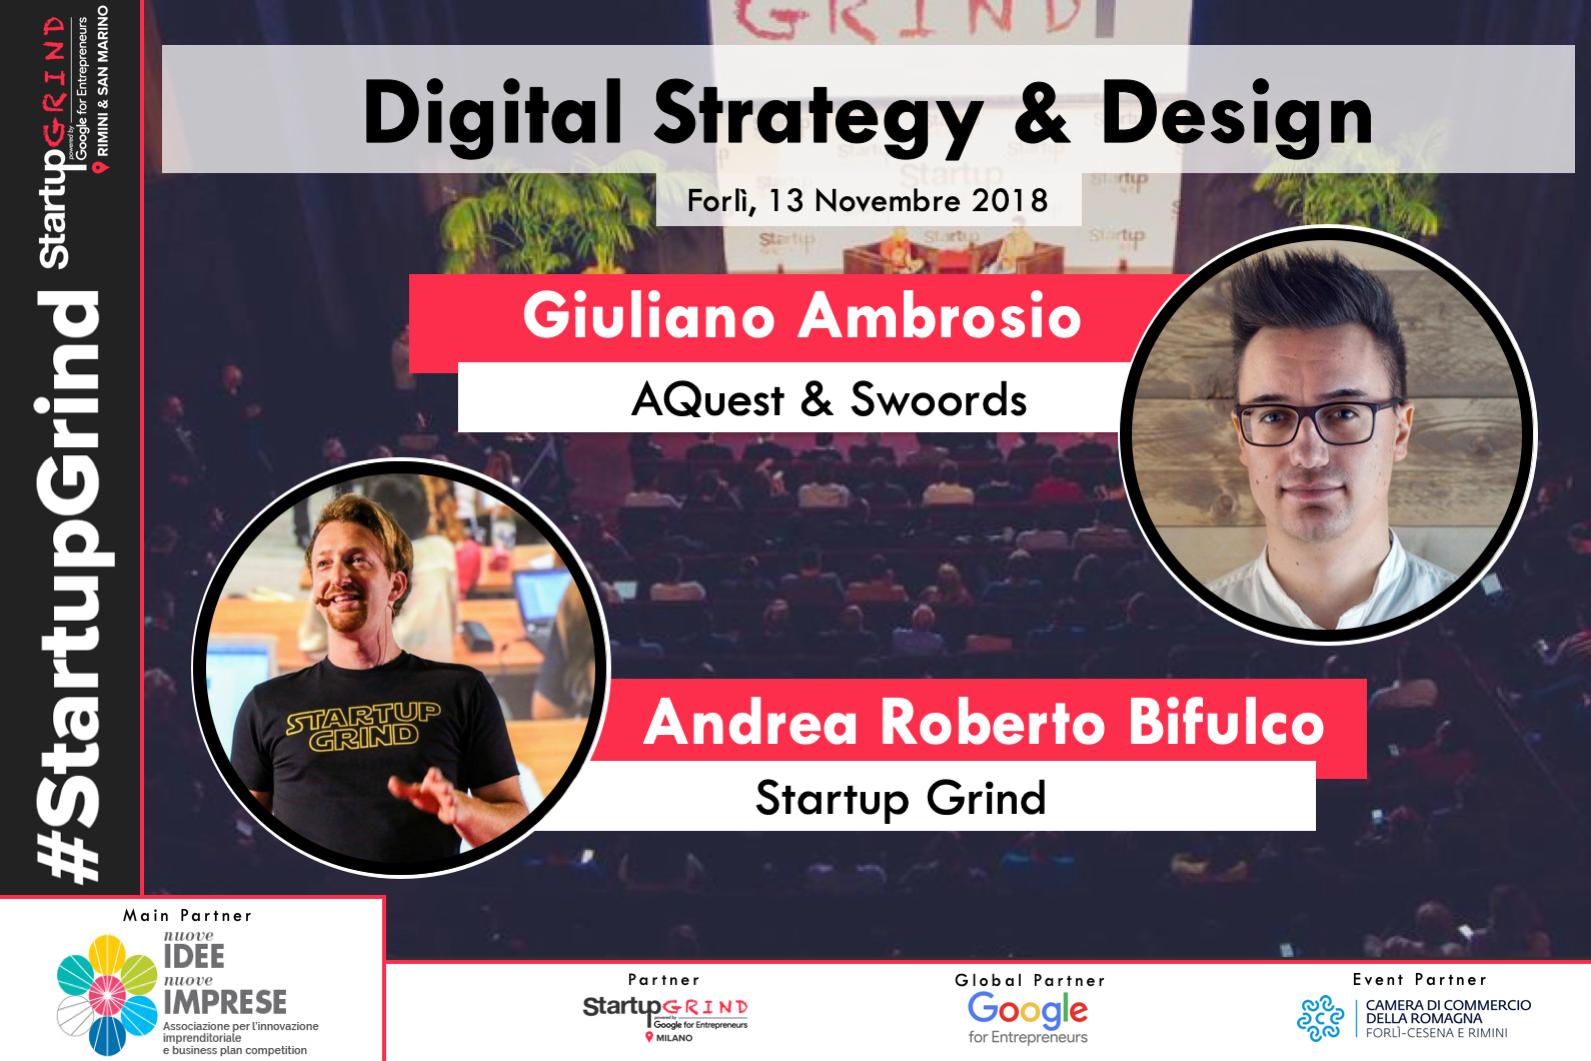 SG RSM Forli - Evento Startup Grind Martedì 13 Novembre ore 18:30 - Forlì